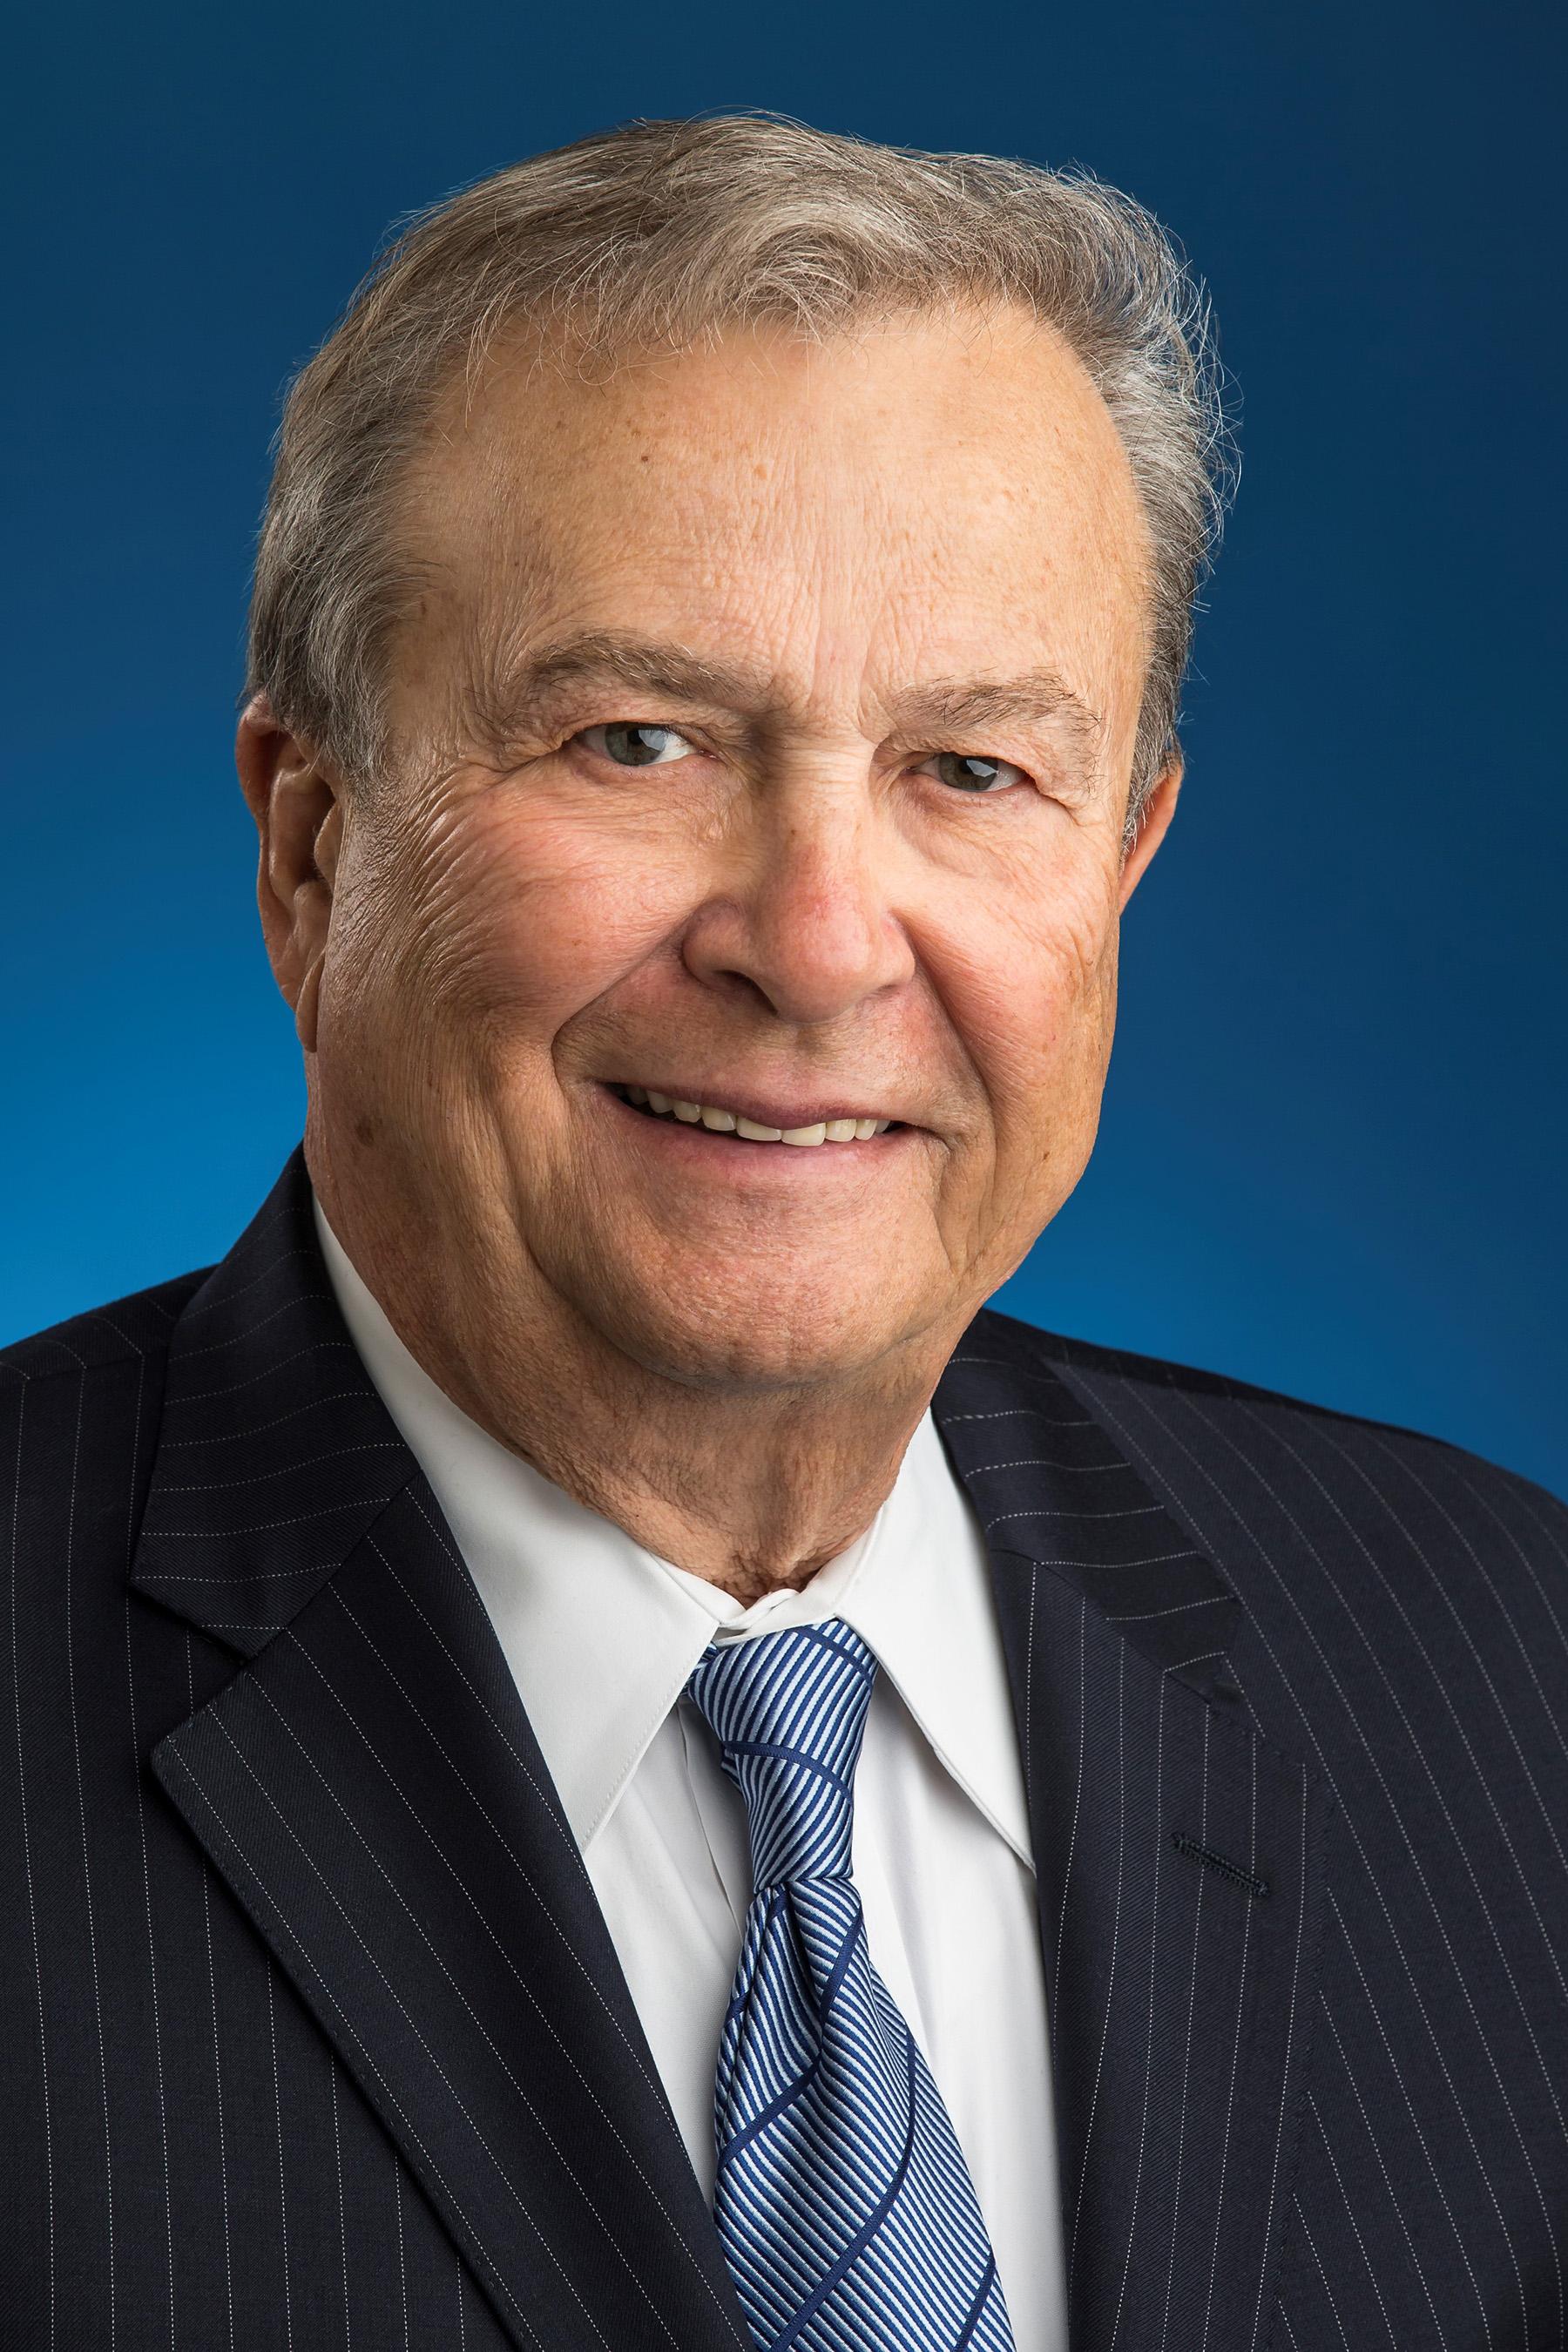 Joseph Simunovich, co-chair, Hackensack Meridian Health Board of Trustees